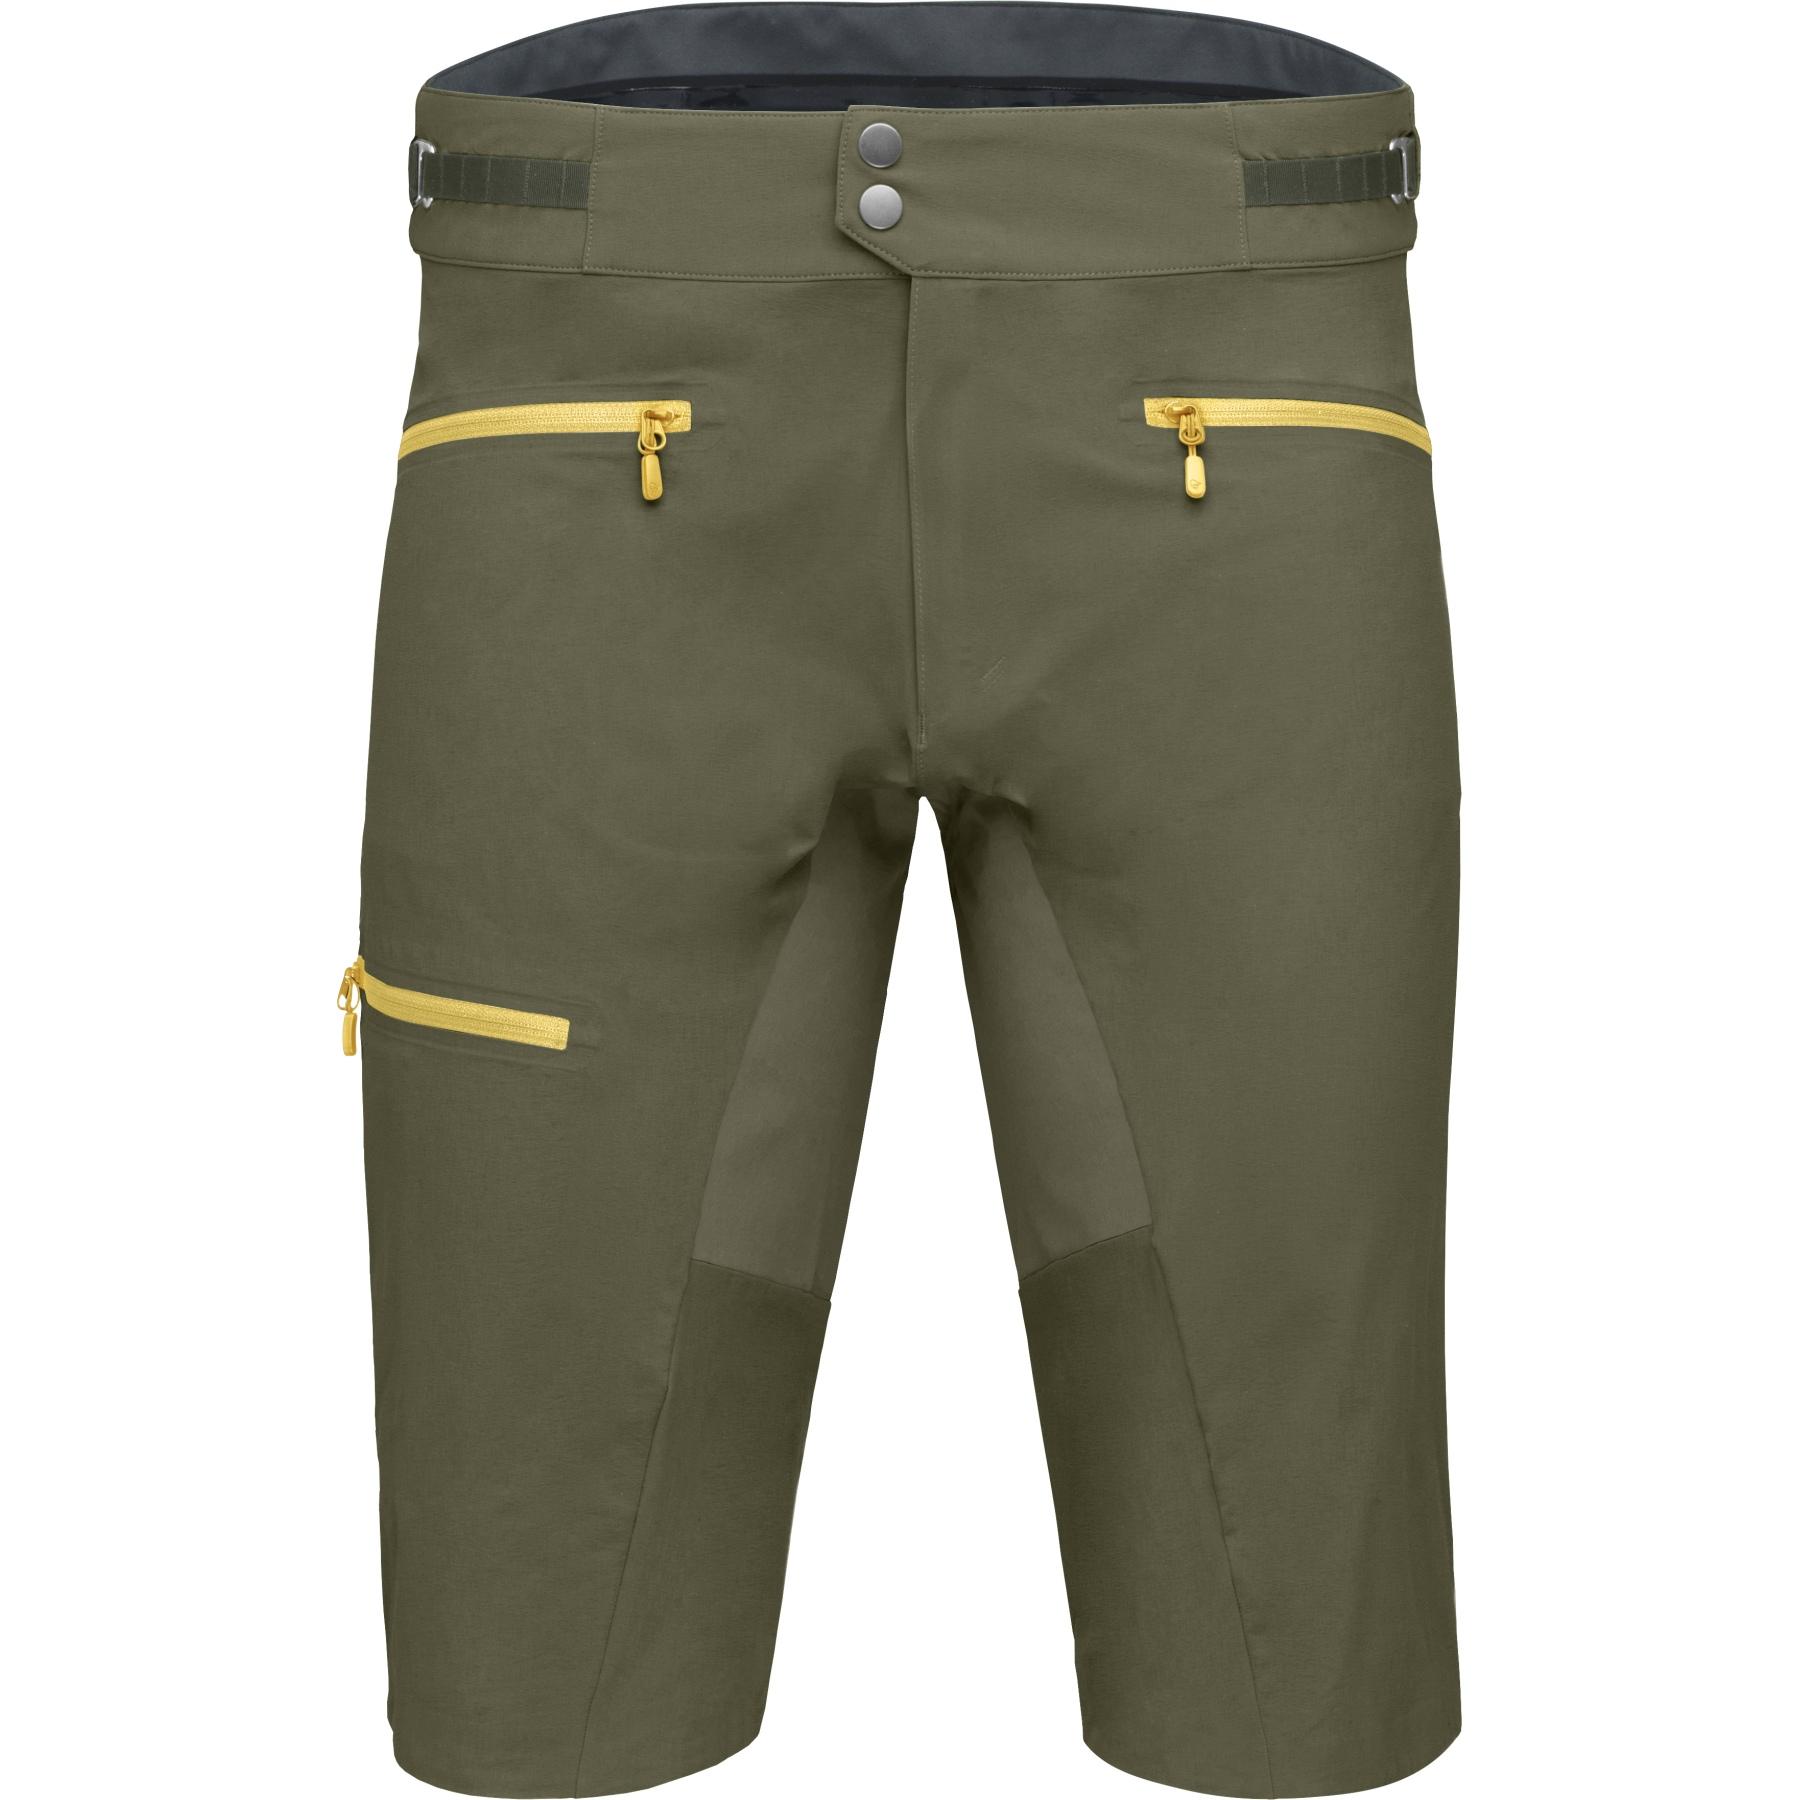 Norrona fjora flex1 mid weight Pantalones cortos para hombres - Olive Night/Lemon Chrome